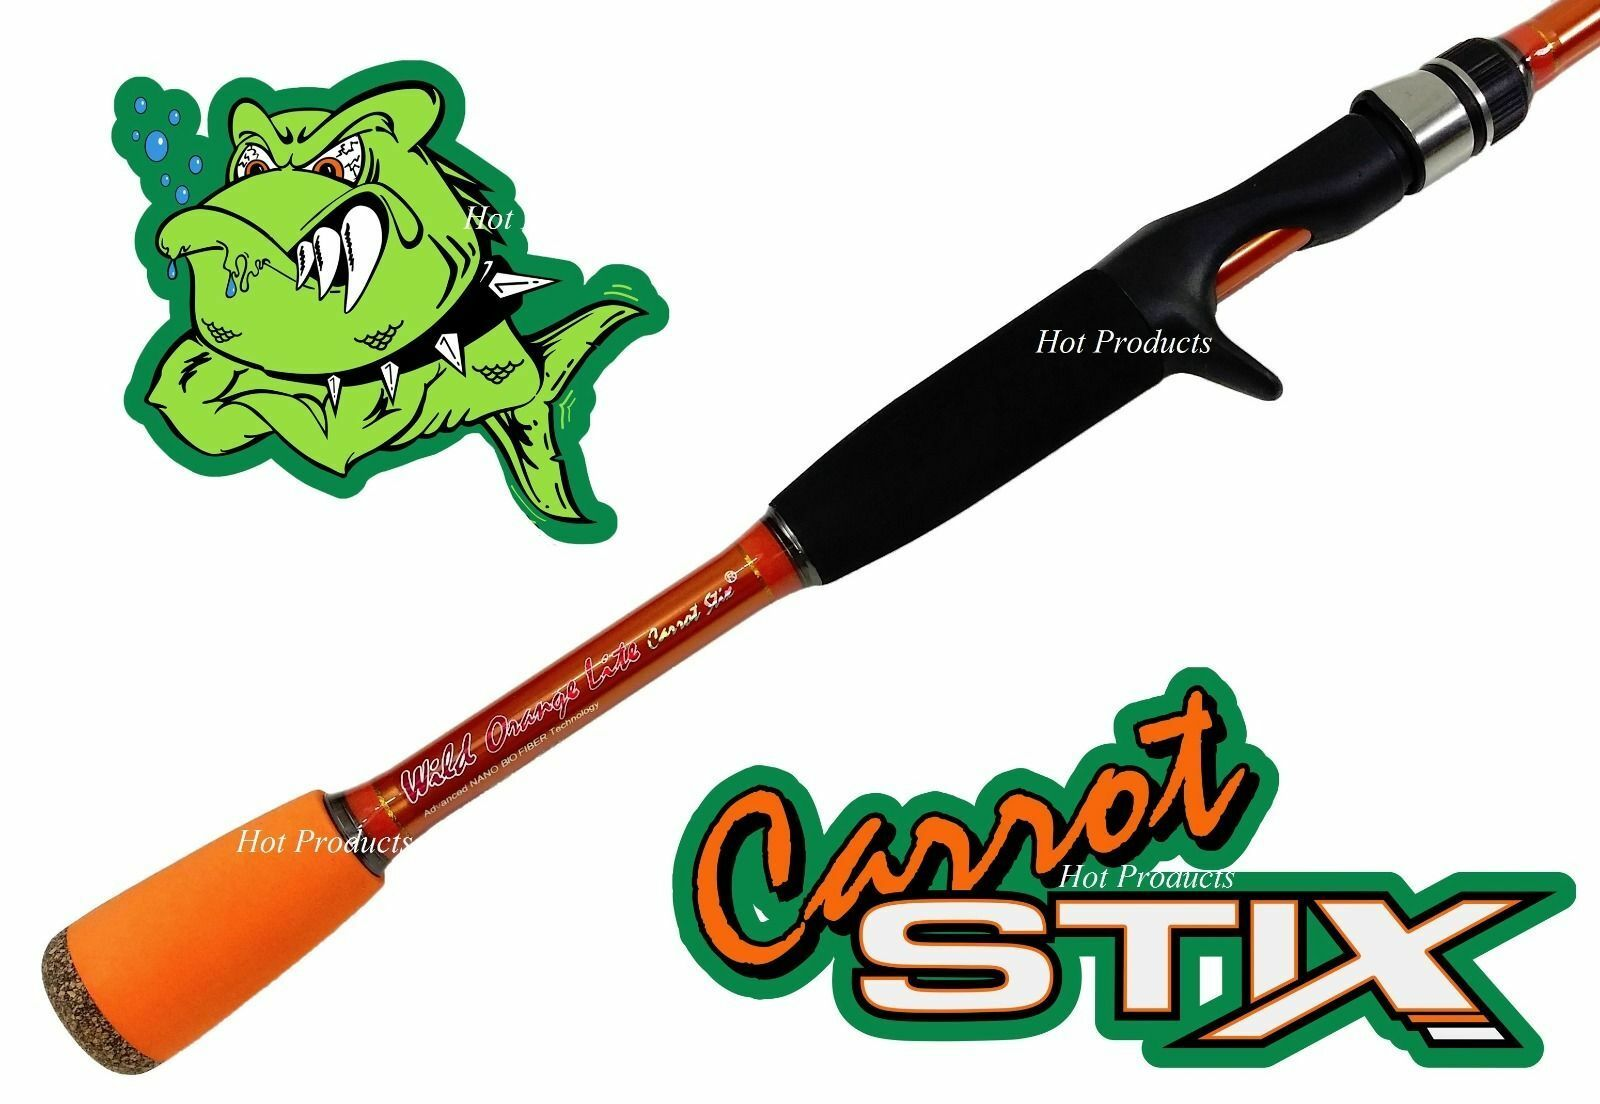 Carred Stix CASTING 6' 7  LIGHT Wild orange Lite Fishing Rod C2WX671L-F-C